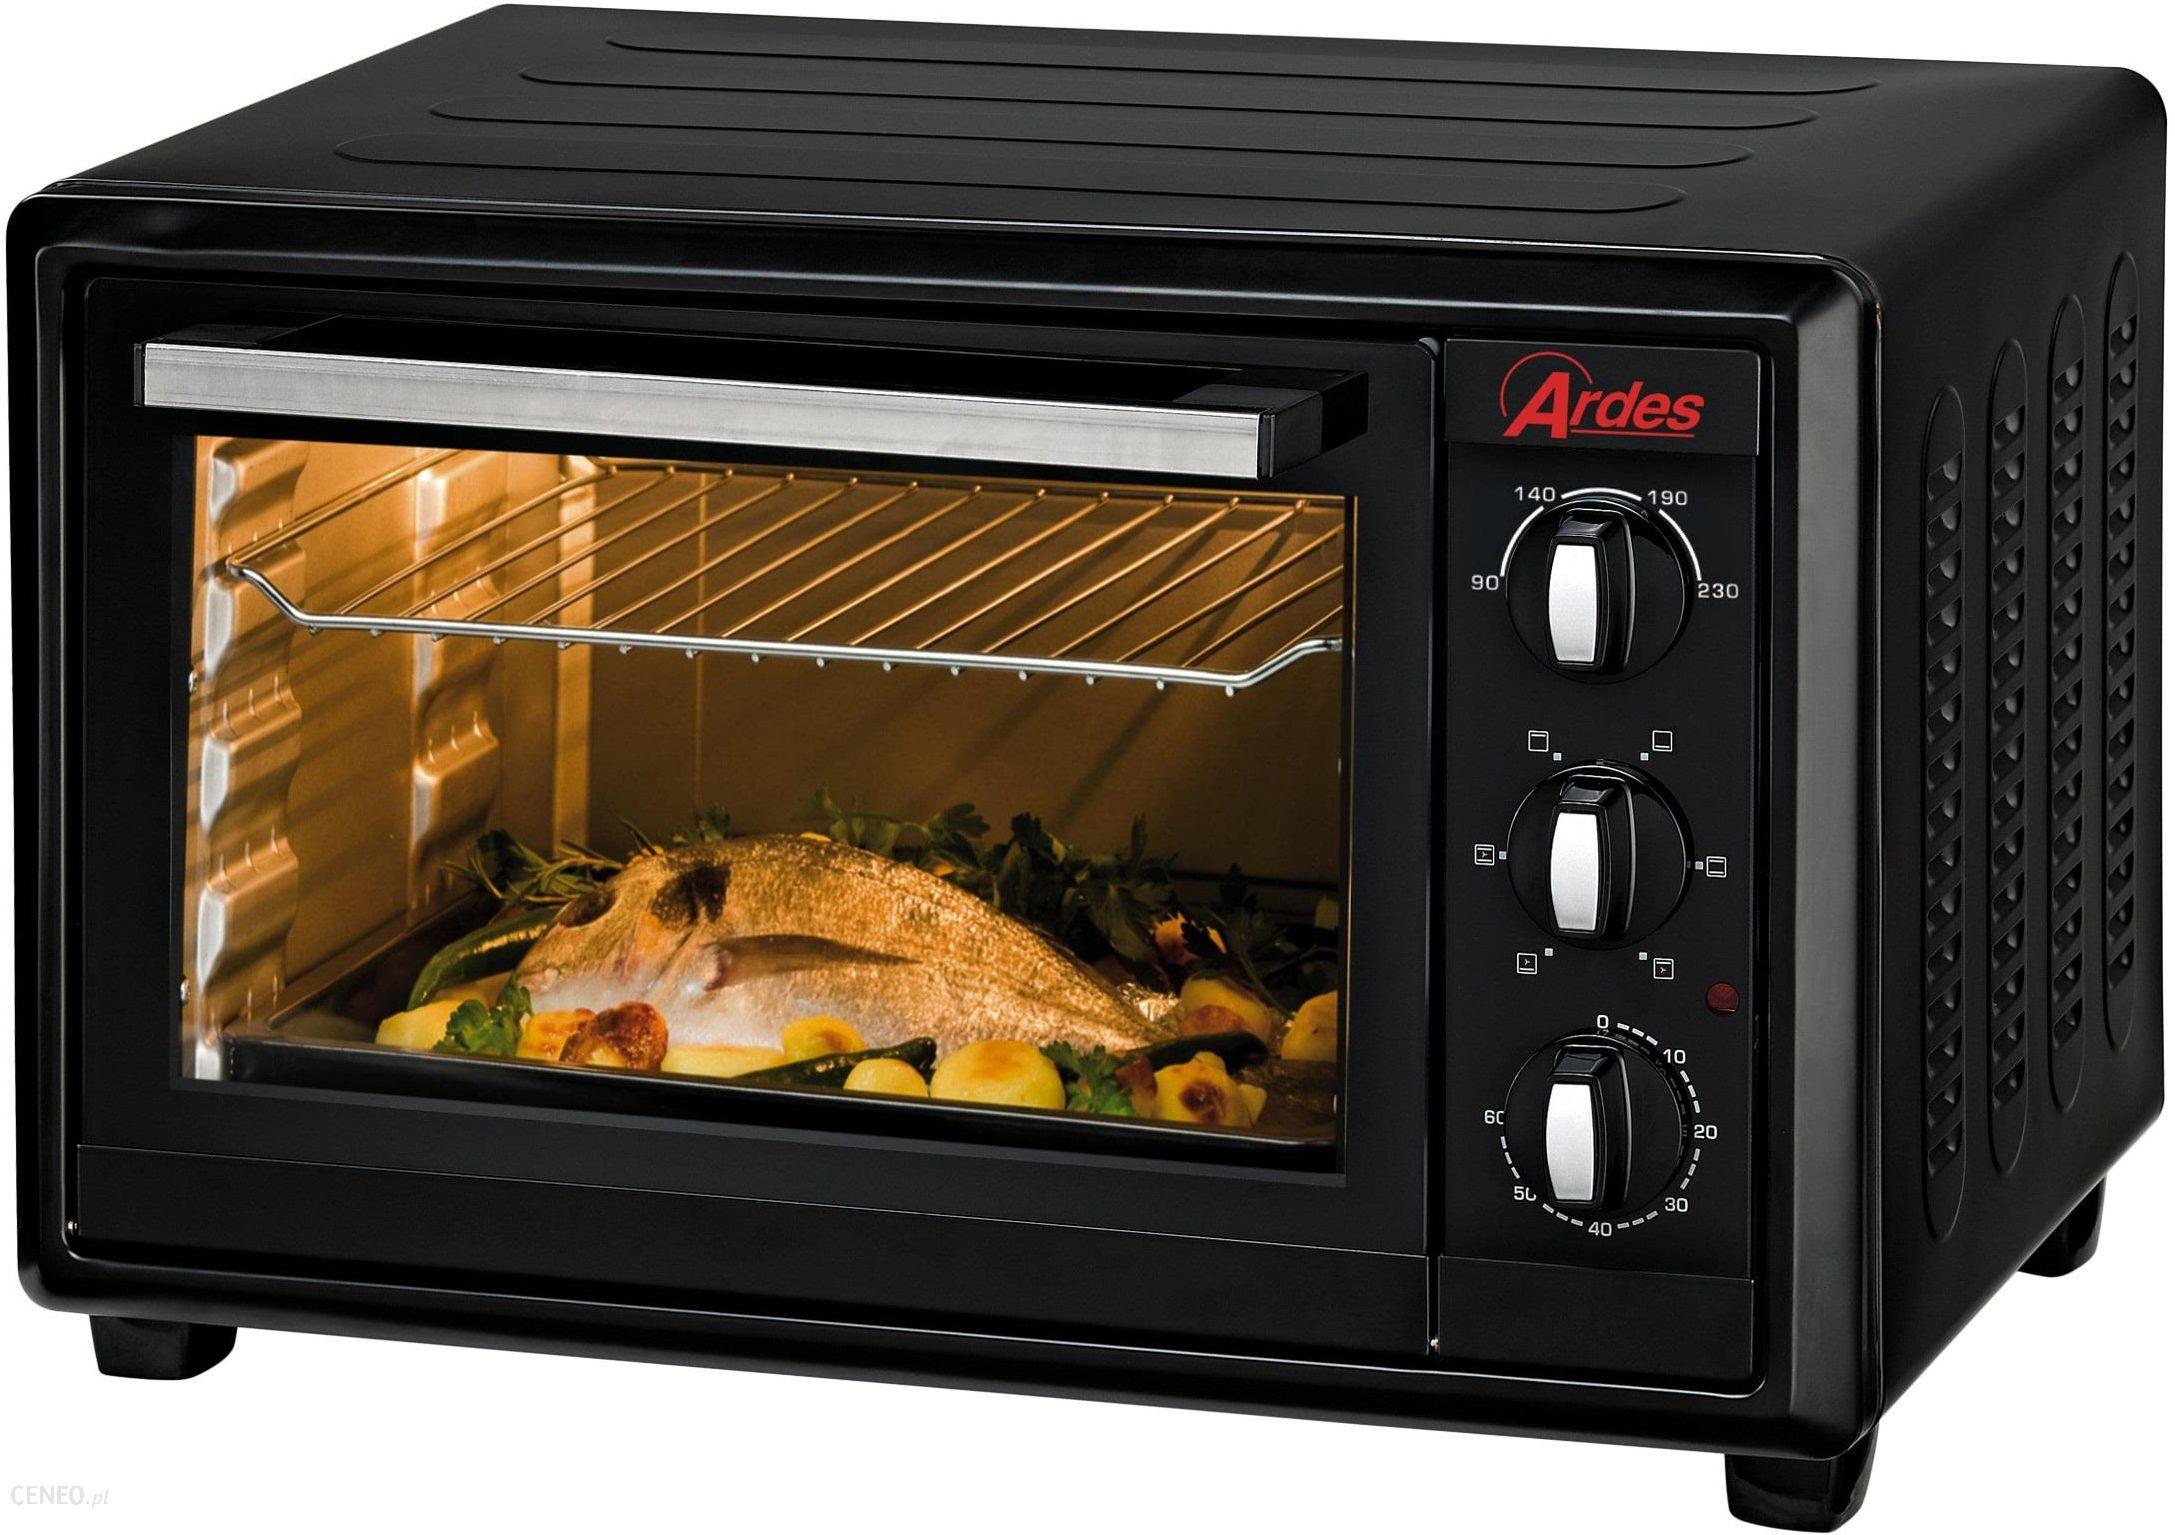 Mini piekarnik ardes 6245 opinie i ceny na - Miglior forno elettrico per pizzeria ...